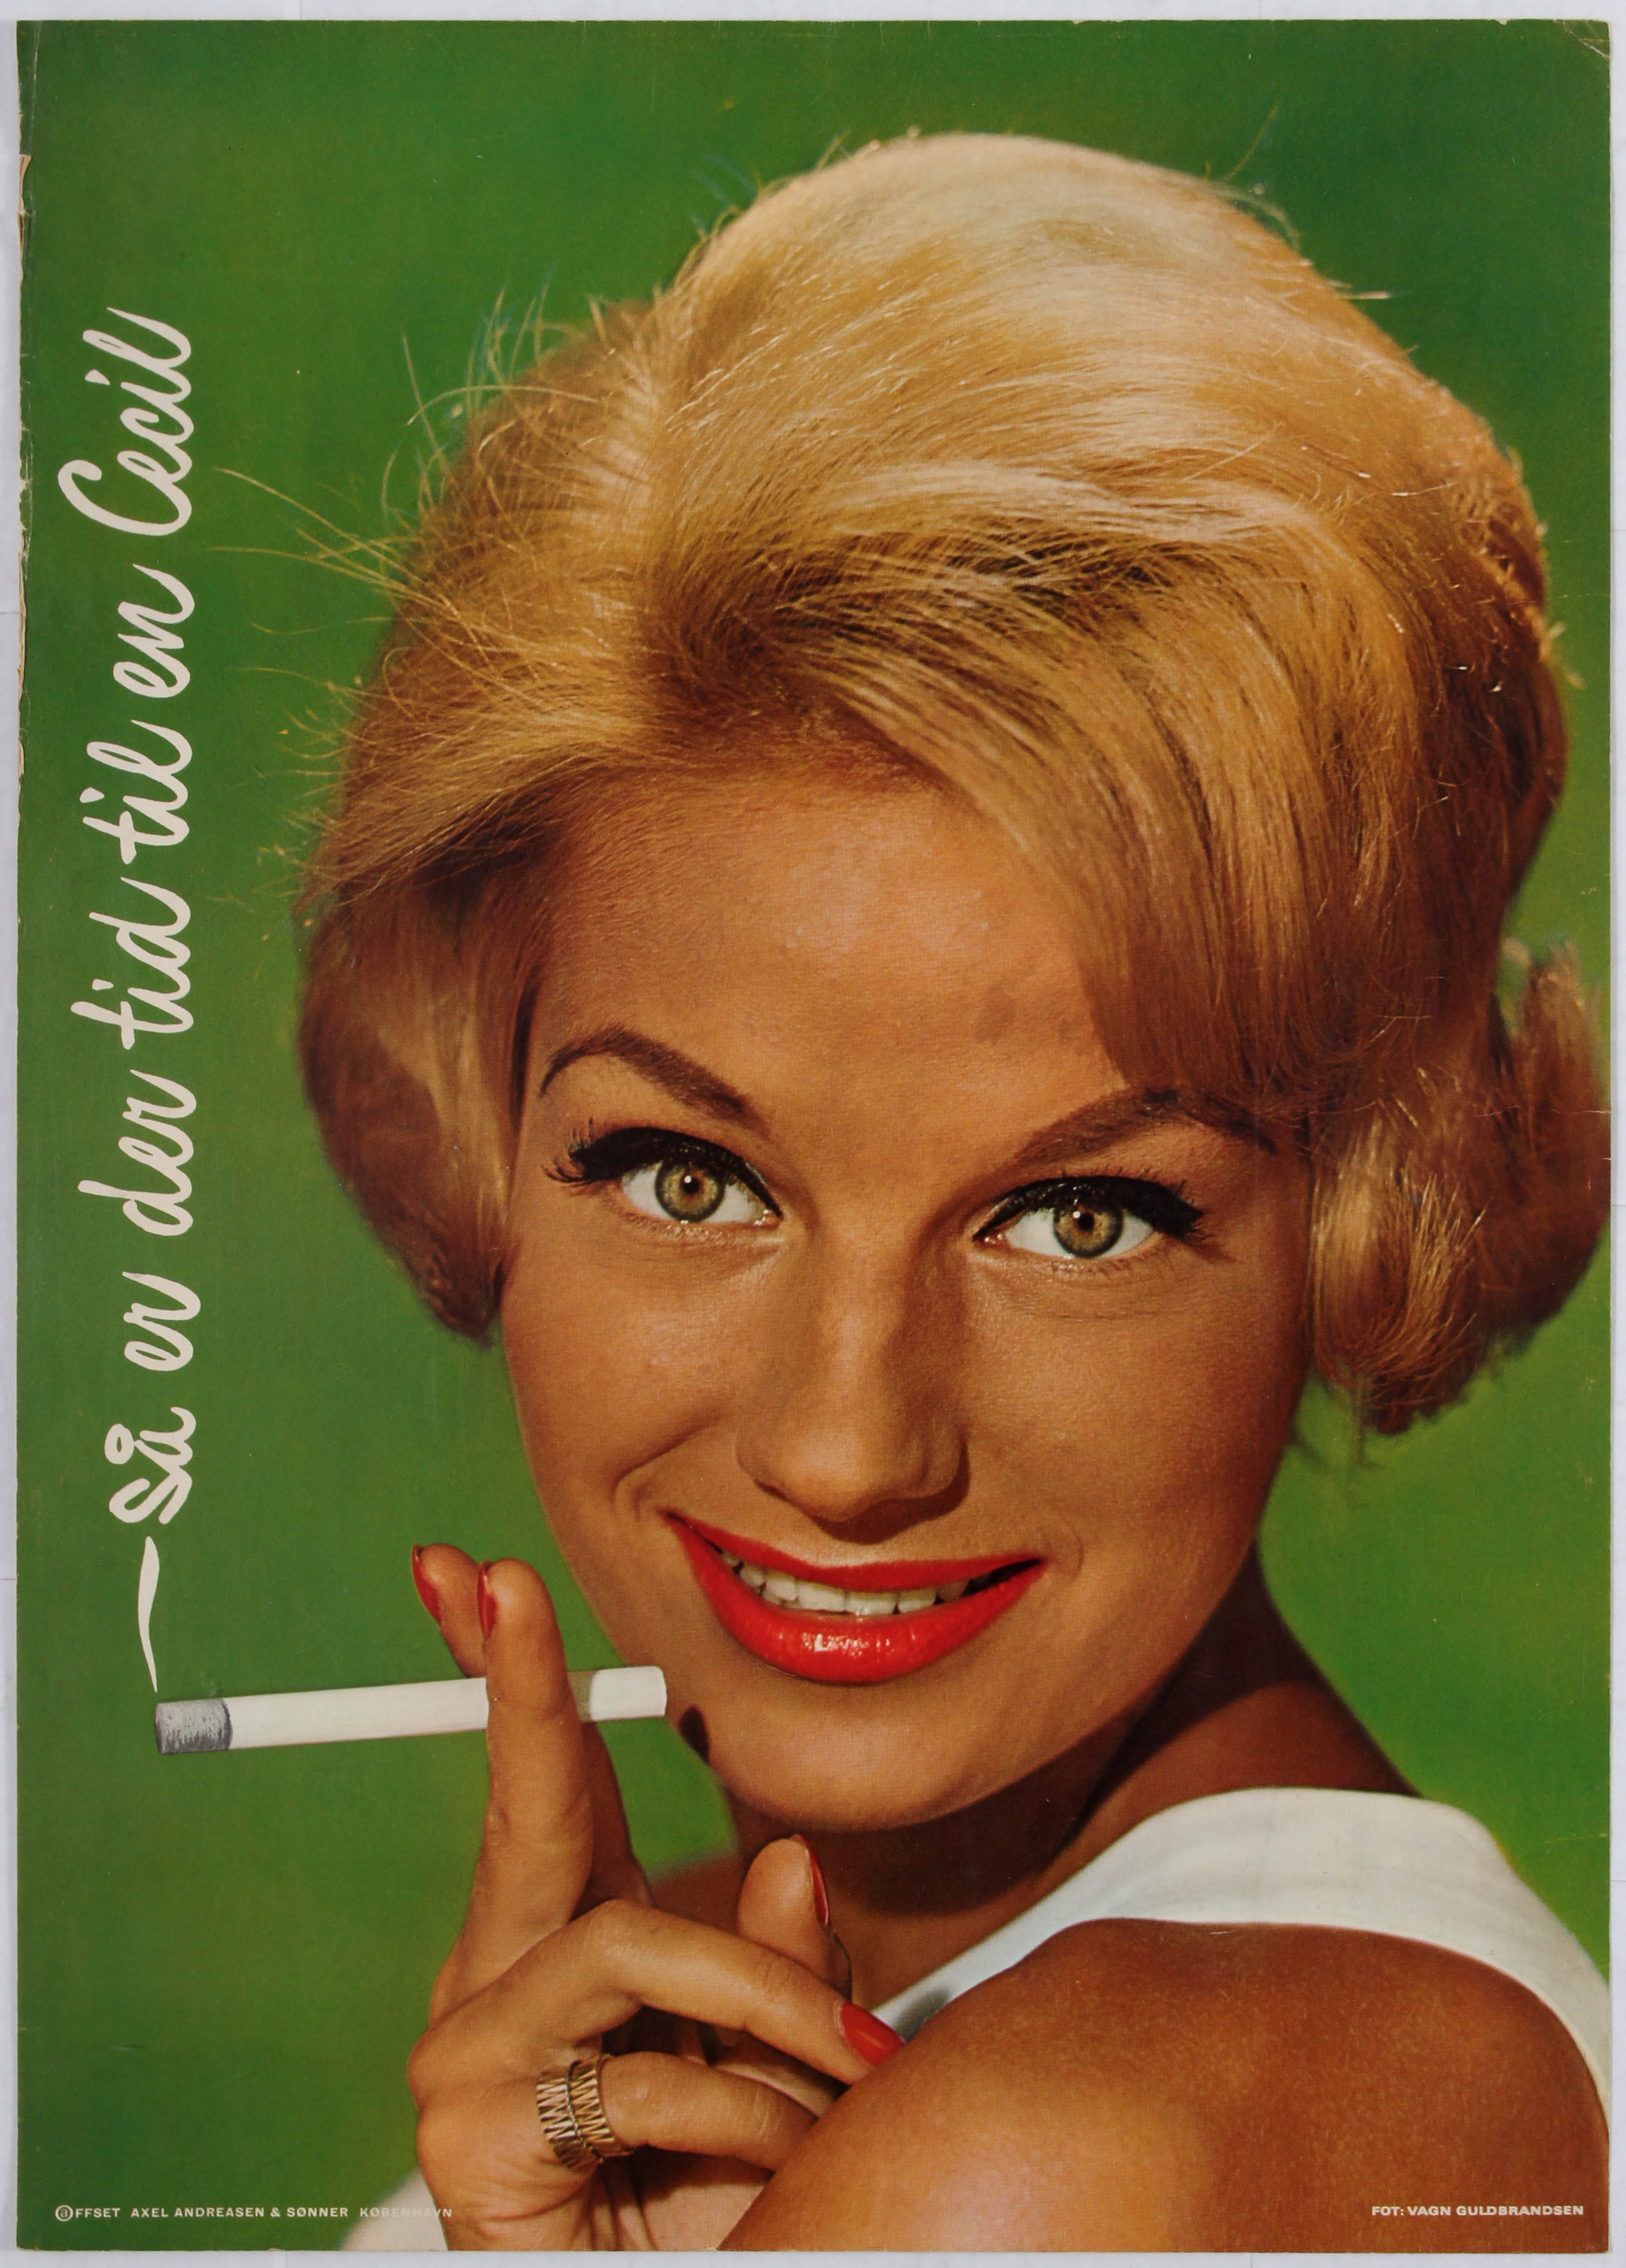 Lot 1601 - Advertising Poster Danish Cigarette Advertising